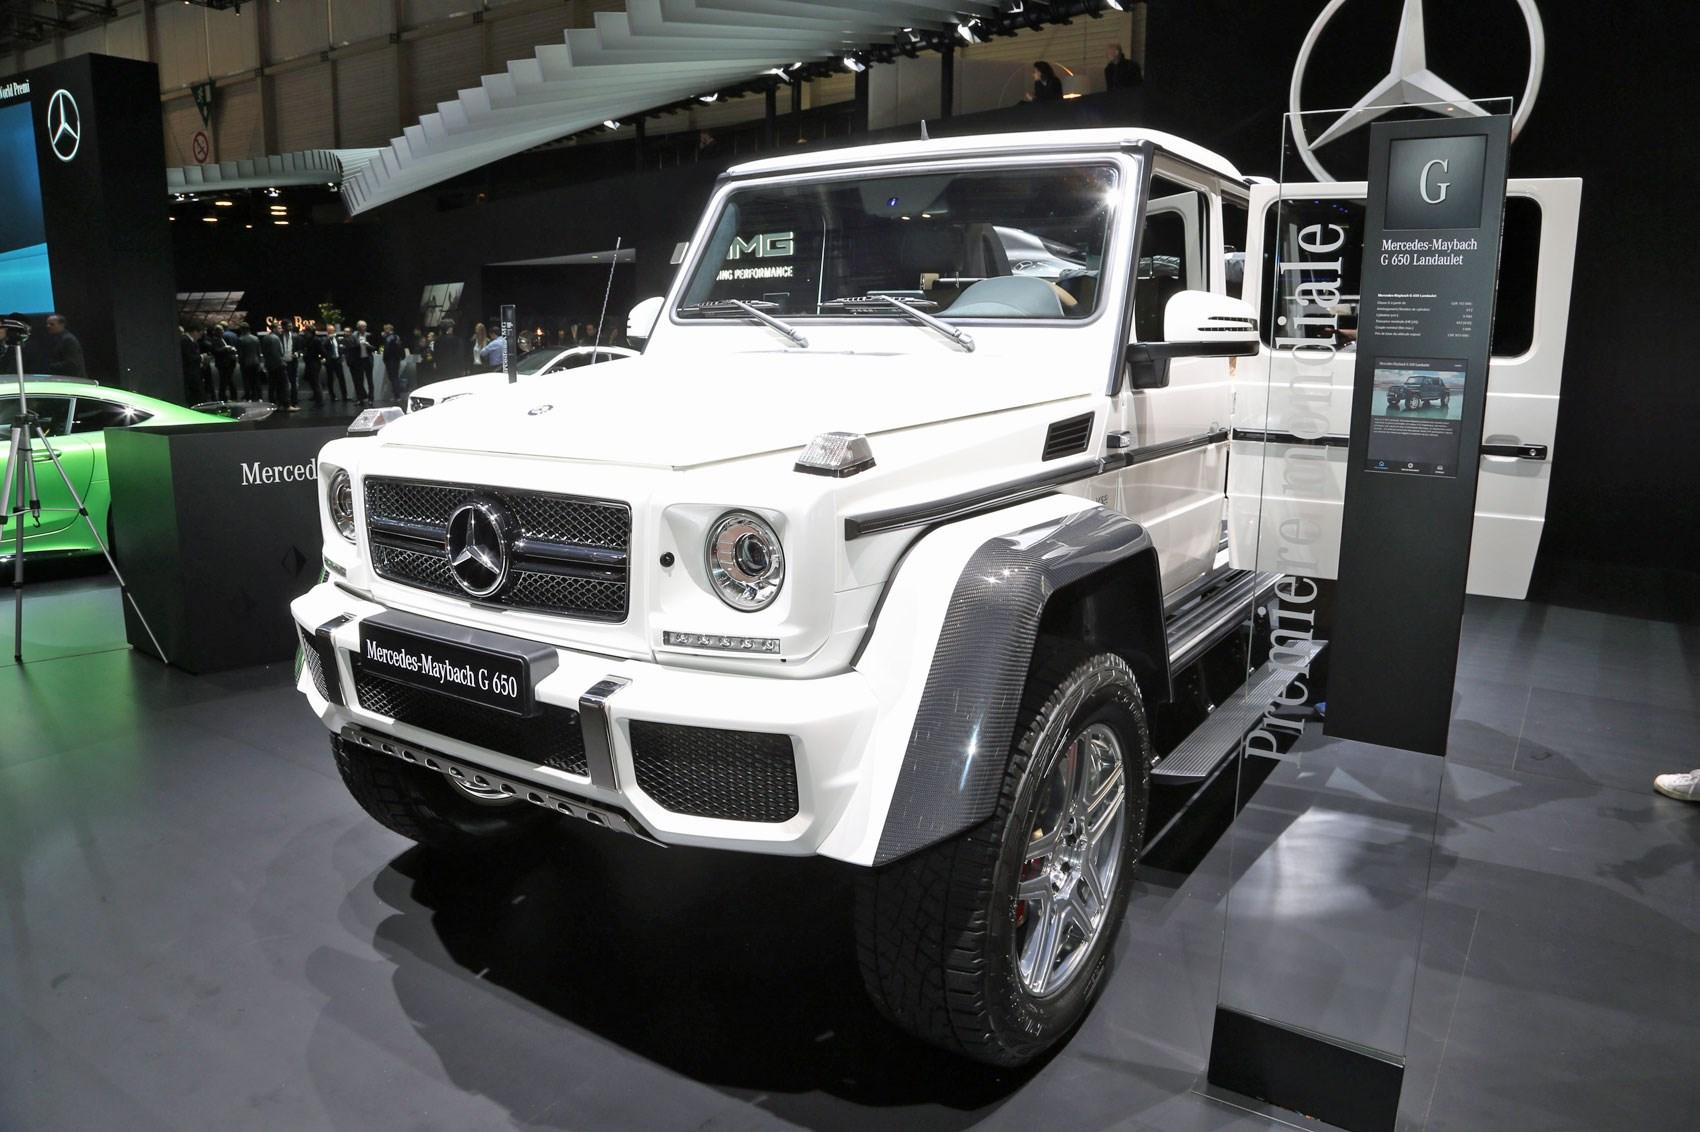 Make way mercedes maybach g650 landaulet by car magazine for Mercedes benz maybach g650